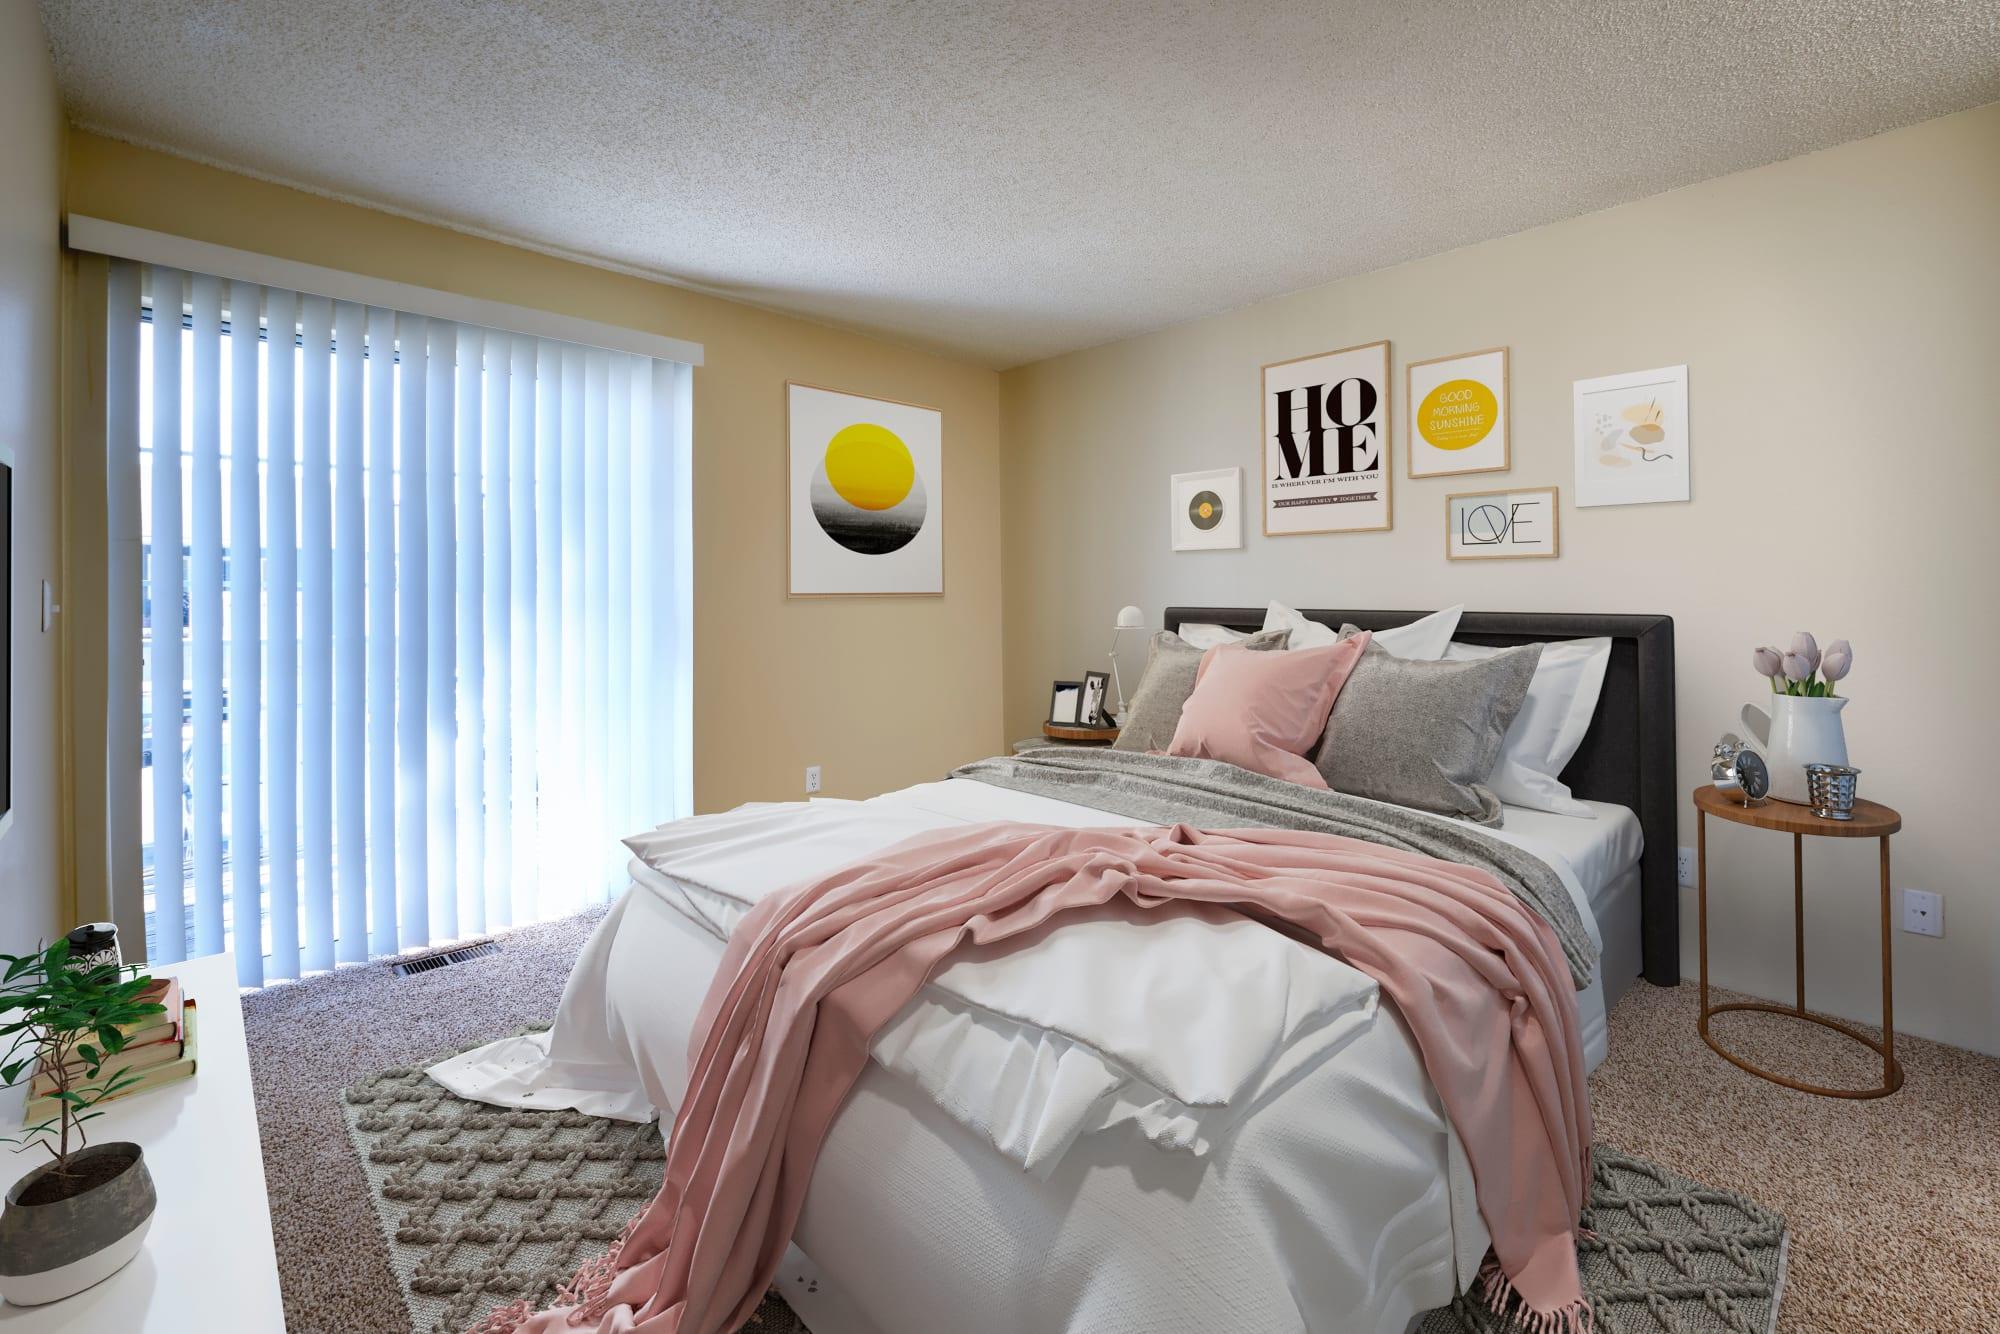 Photos | Bluesky Landing Apartments in Lakewood, CO